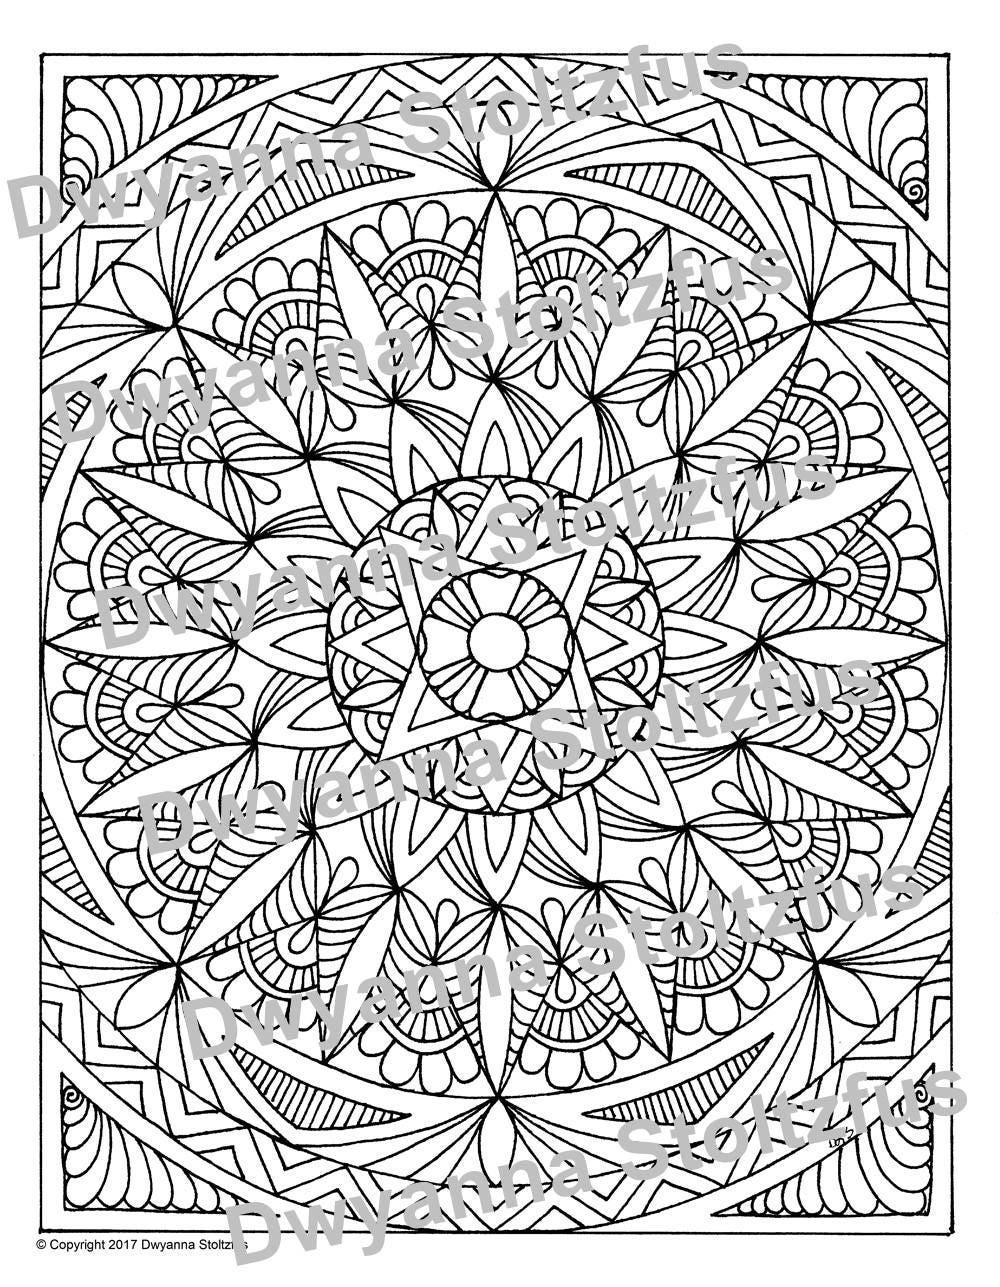 full page mandala 1 coloring page jpg etsy. Black Bedroom Furniture Sets. Home Design Ideas